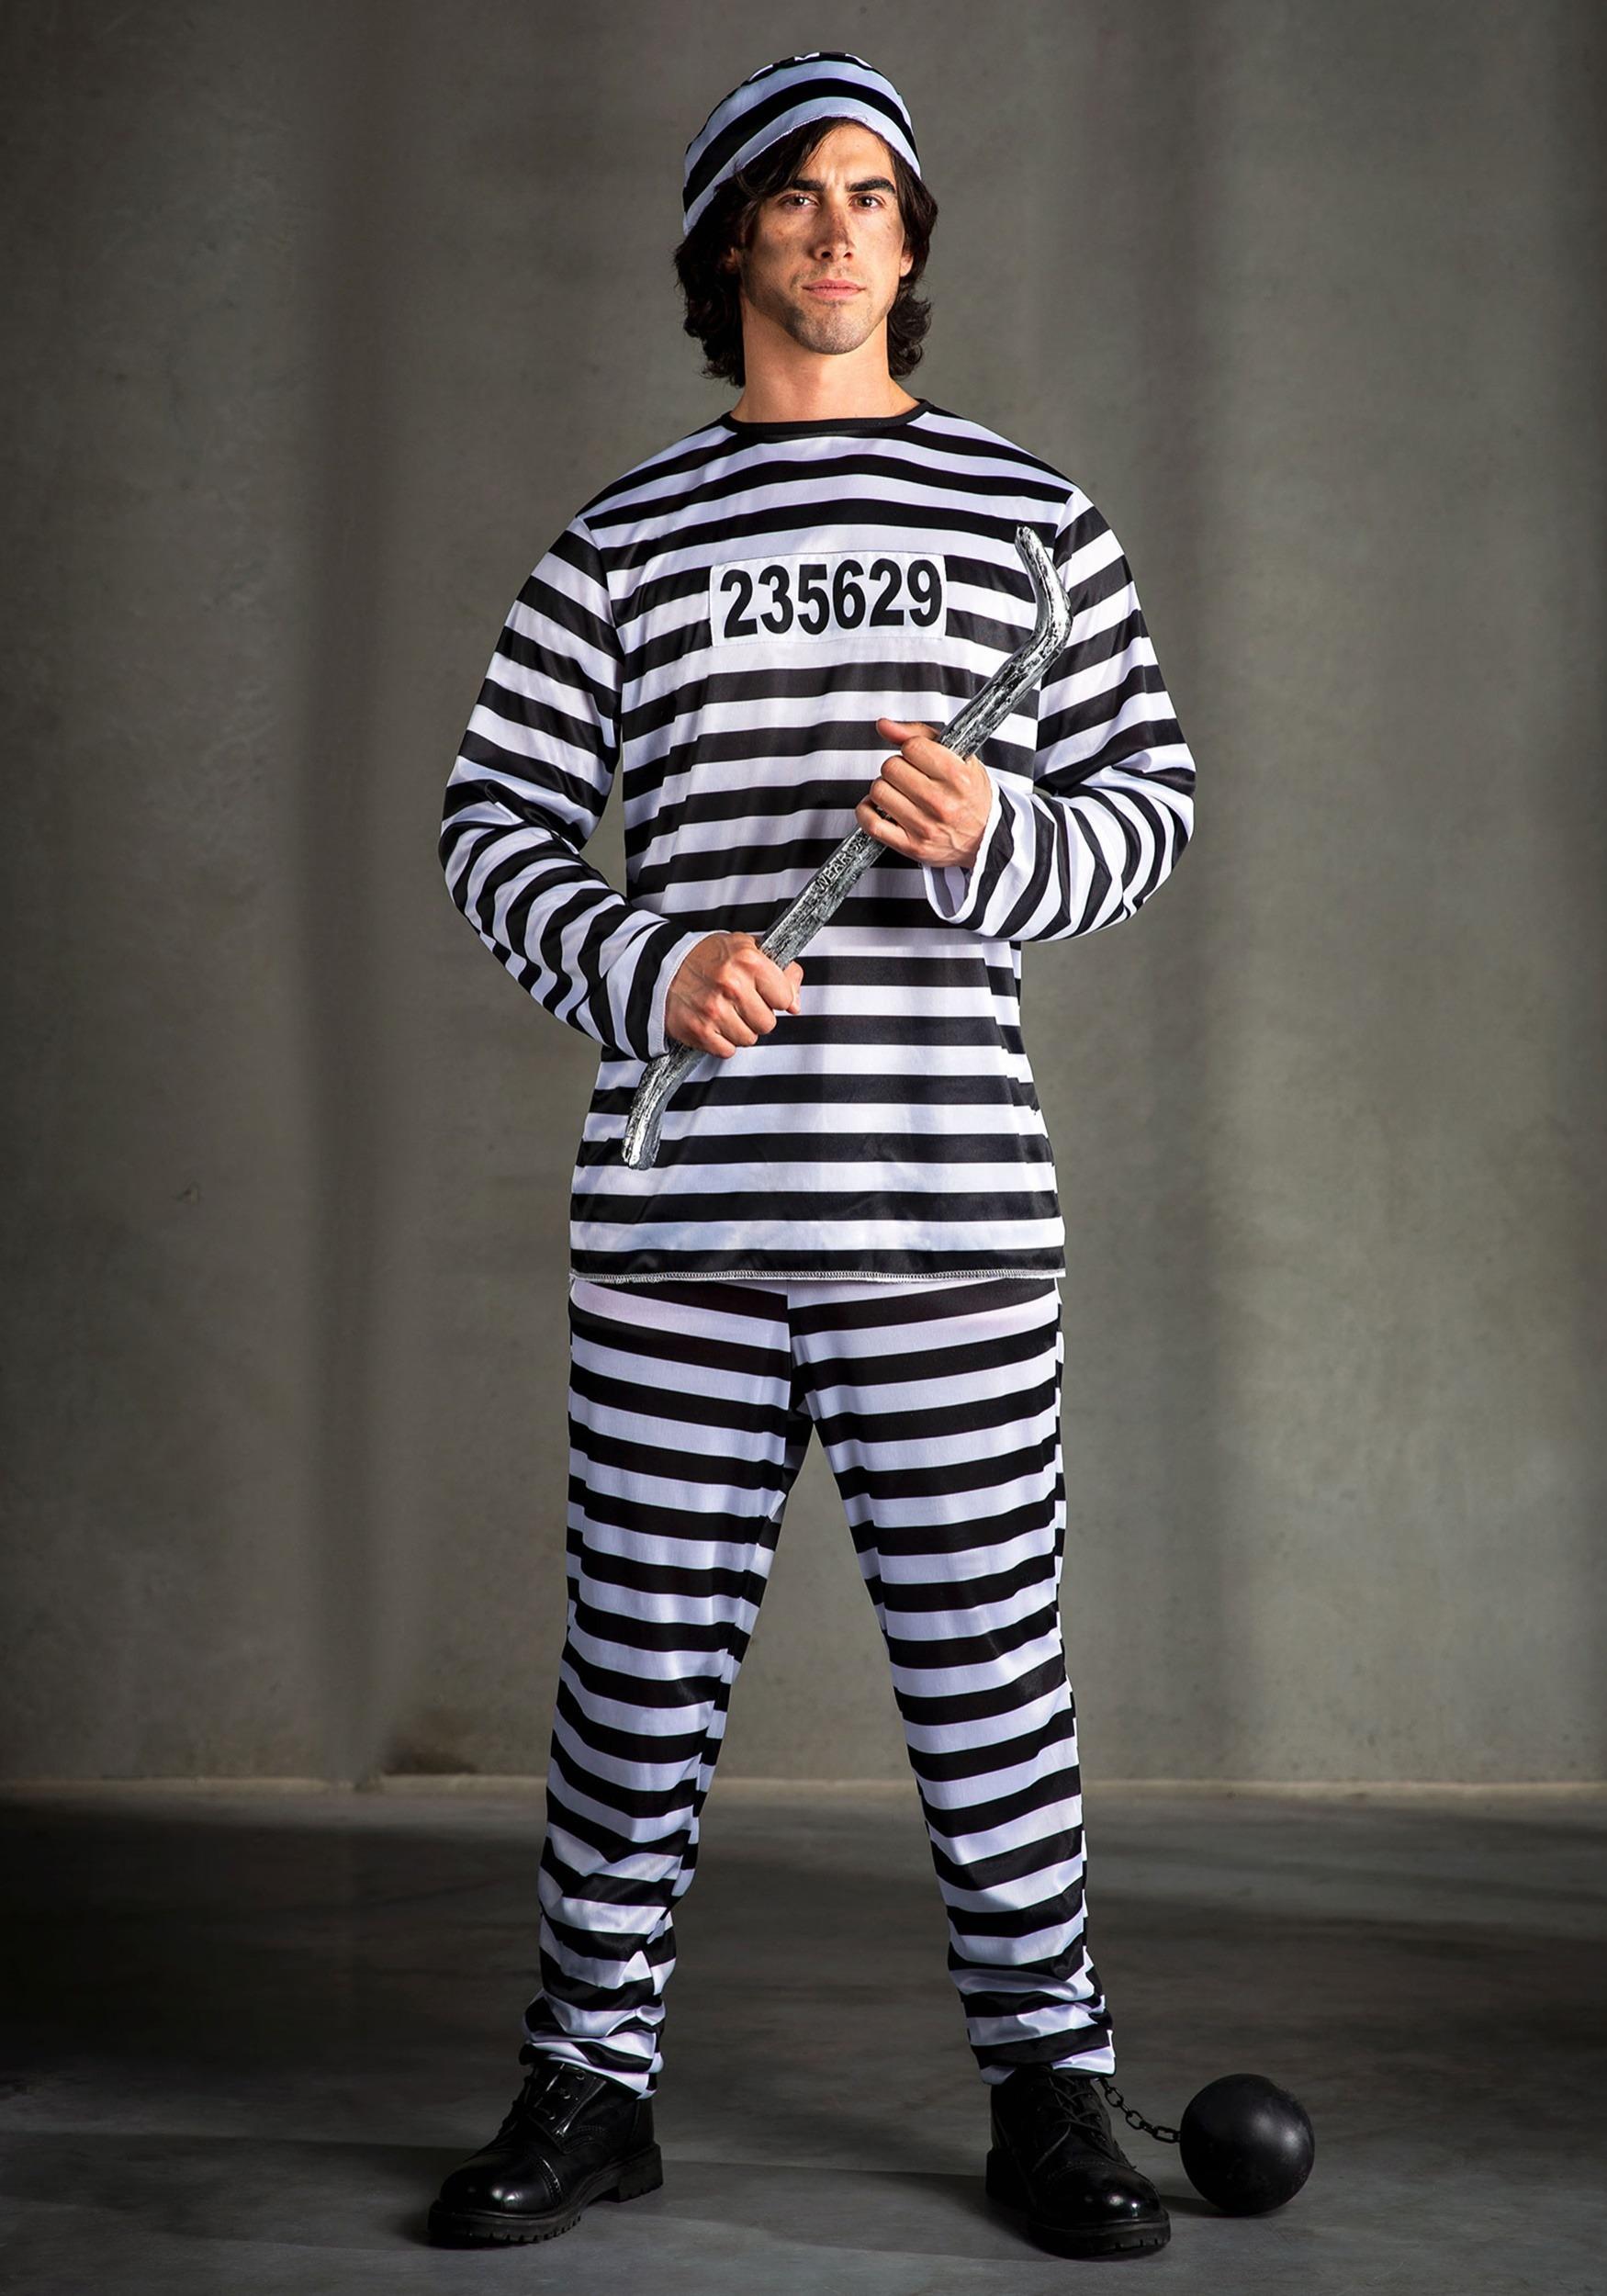 Mens Prisoner Costume  sc 1 st  Halloween Costumes UK & Prisoner Costumes - Sexy Prisoner Halloween Costumes